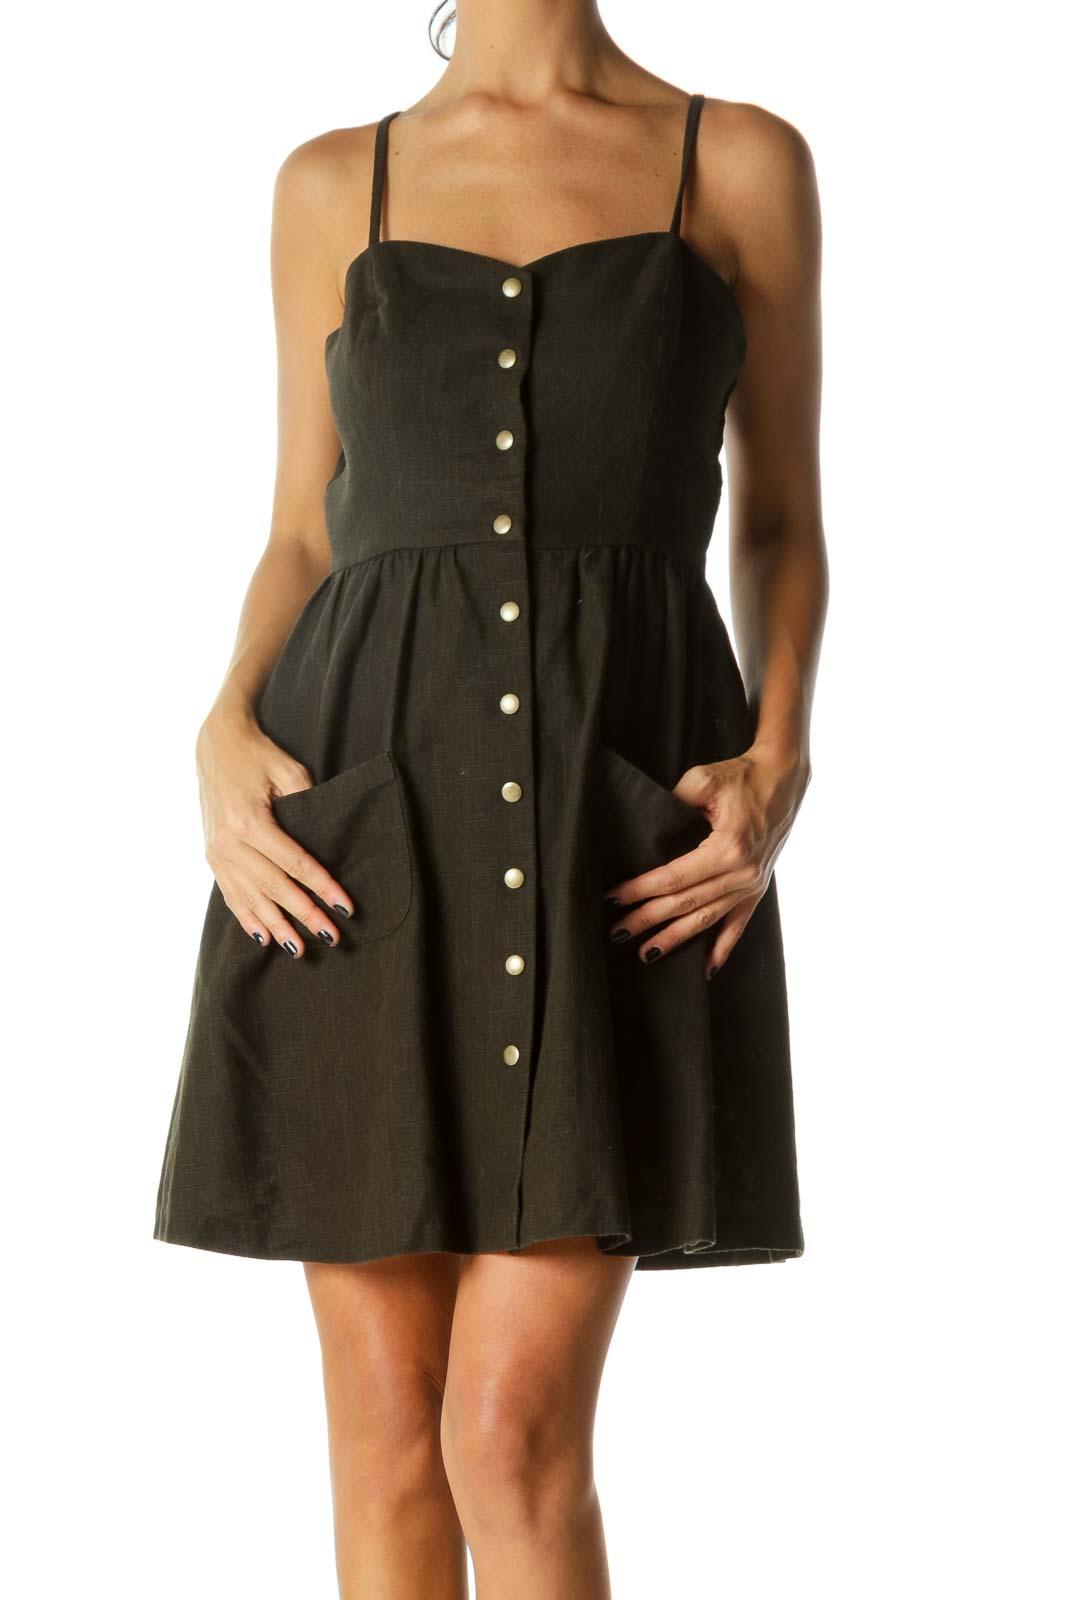 Green Sweetheart Knit Cotton Linen Blend Pocketed Dress Front